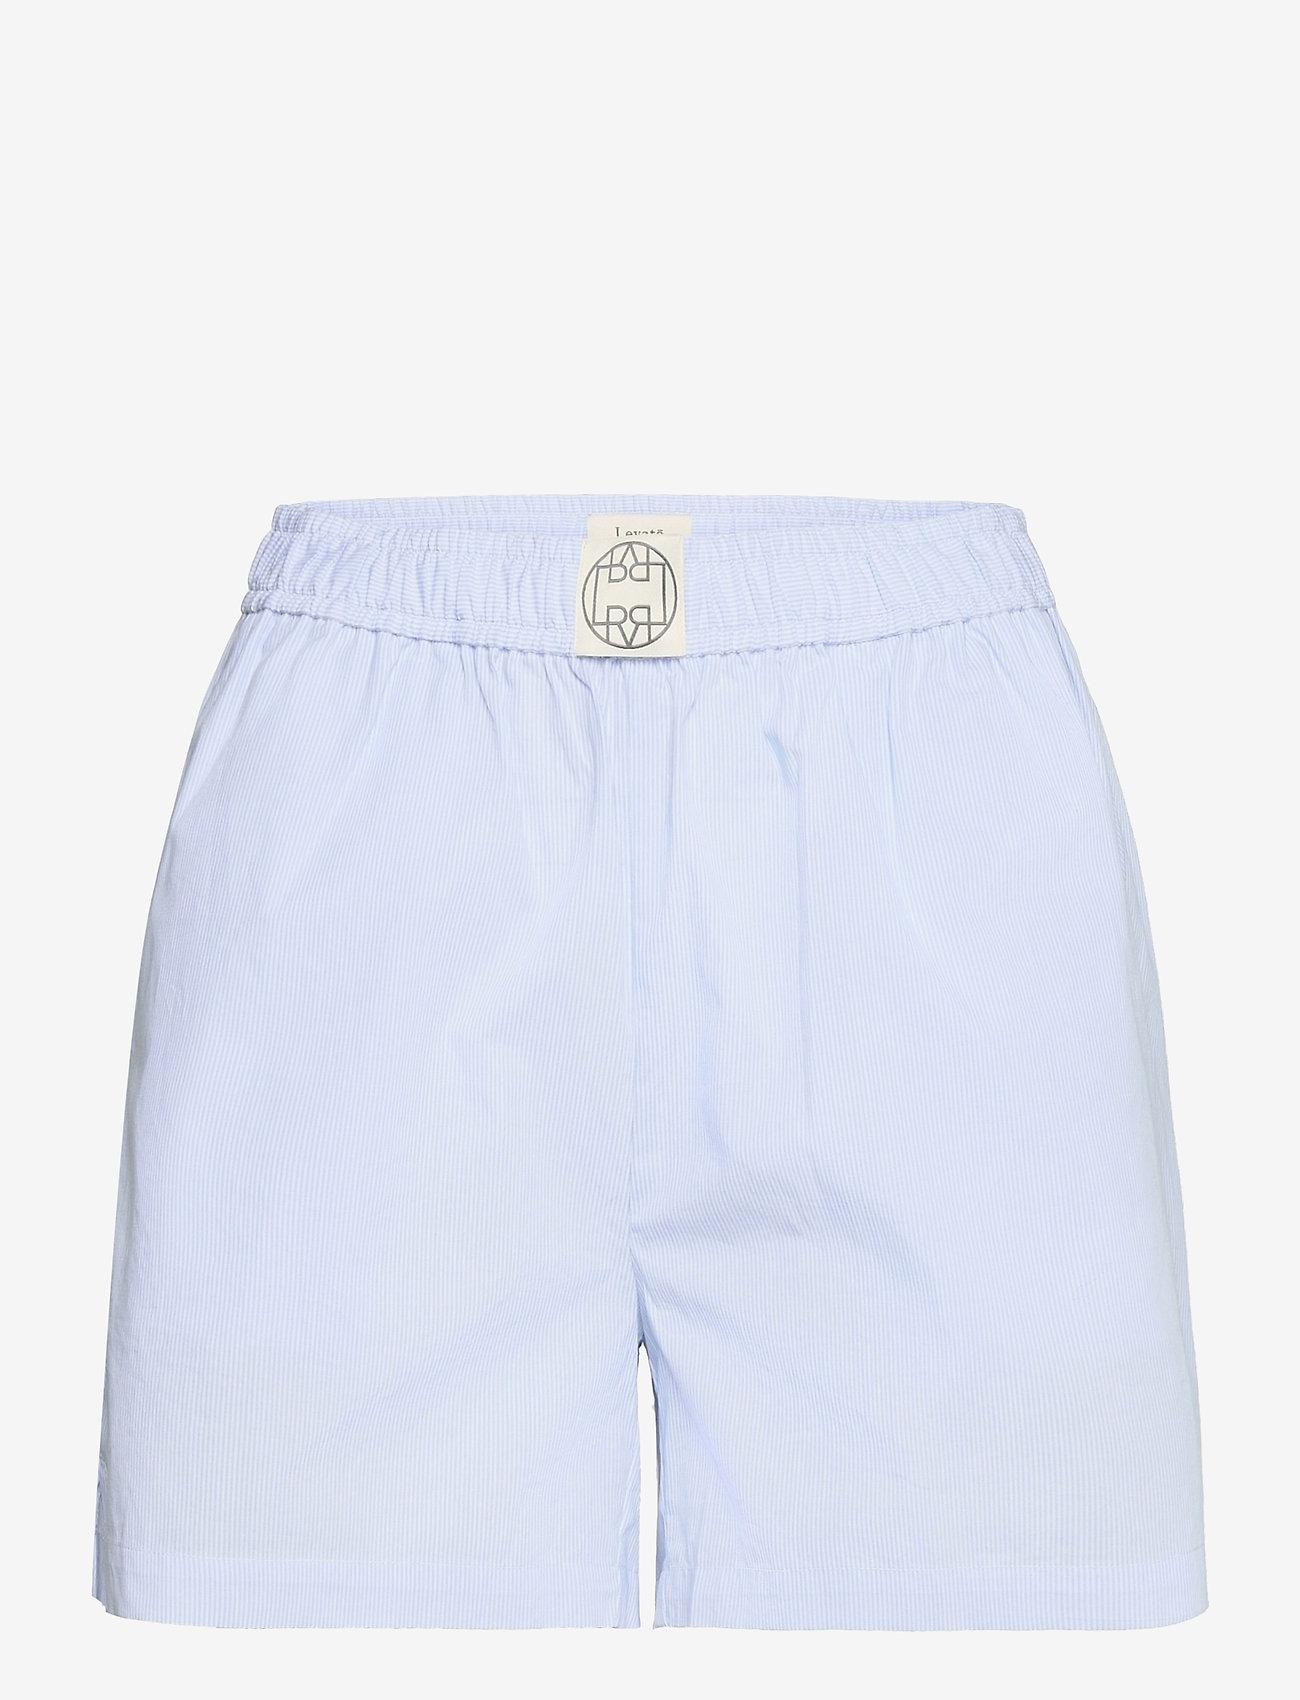 Levete Room - LR-NANNA - shorts casual - l233c - celestial blue combi - 0